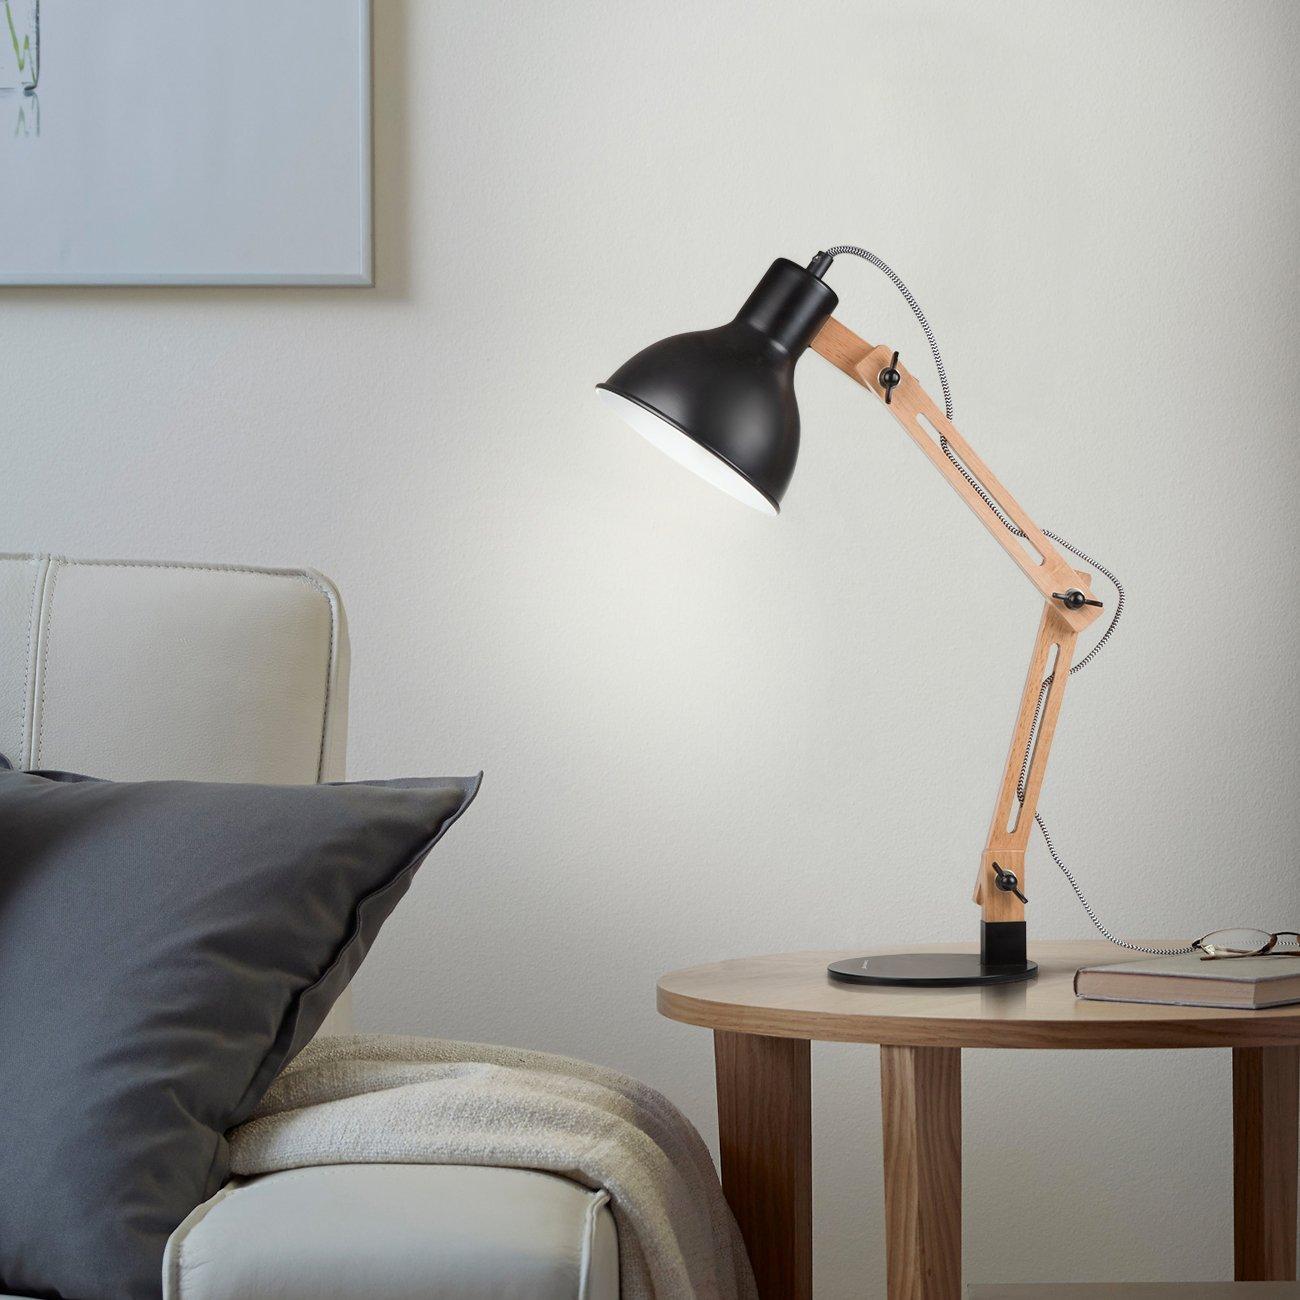 Tomons DL1001B Wood Swing Arm Desk Lamp